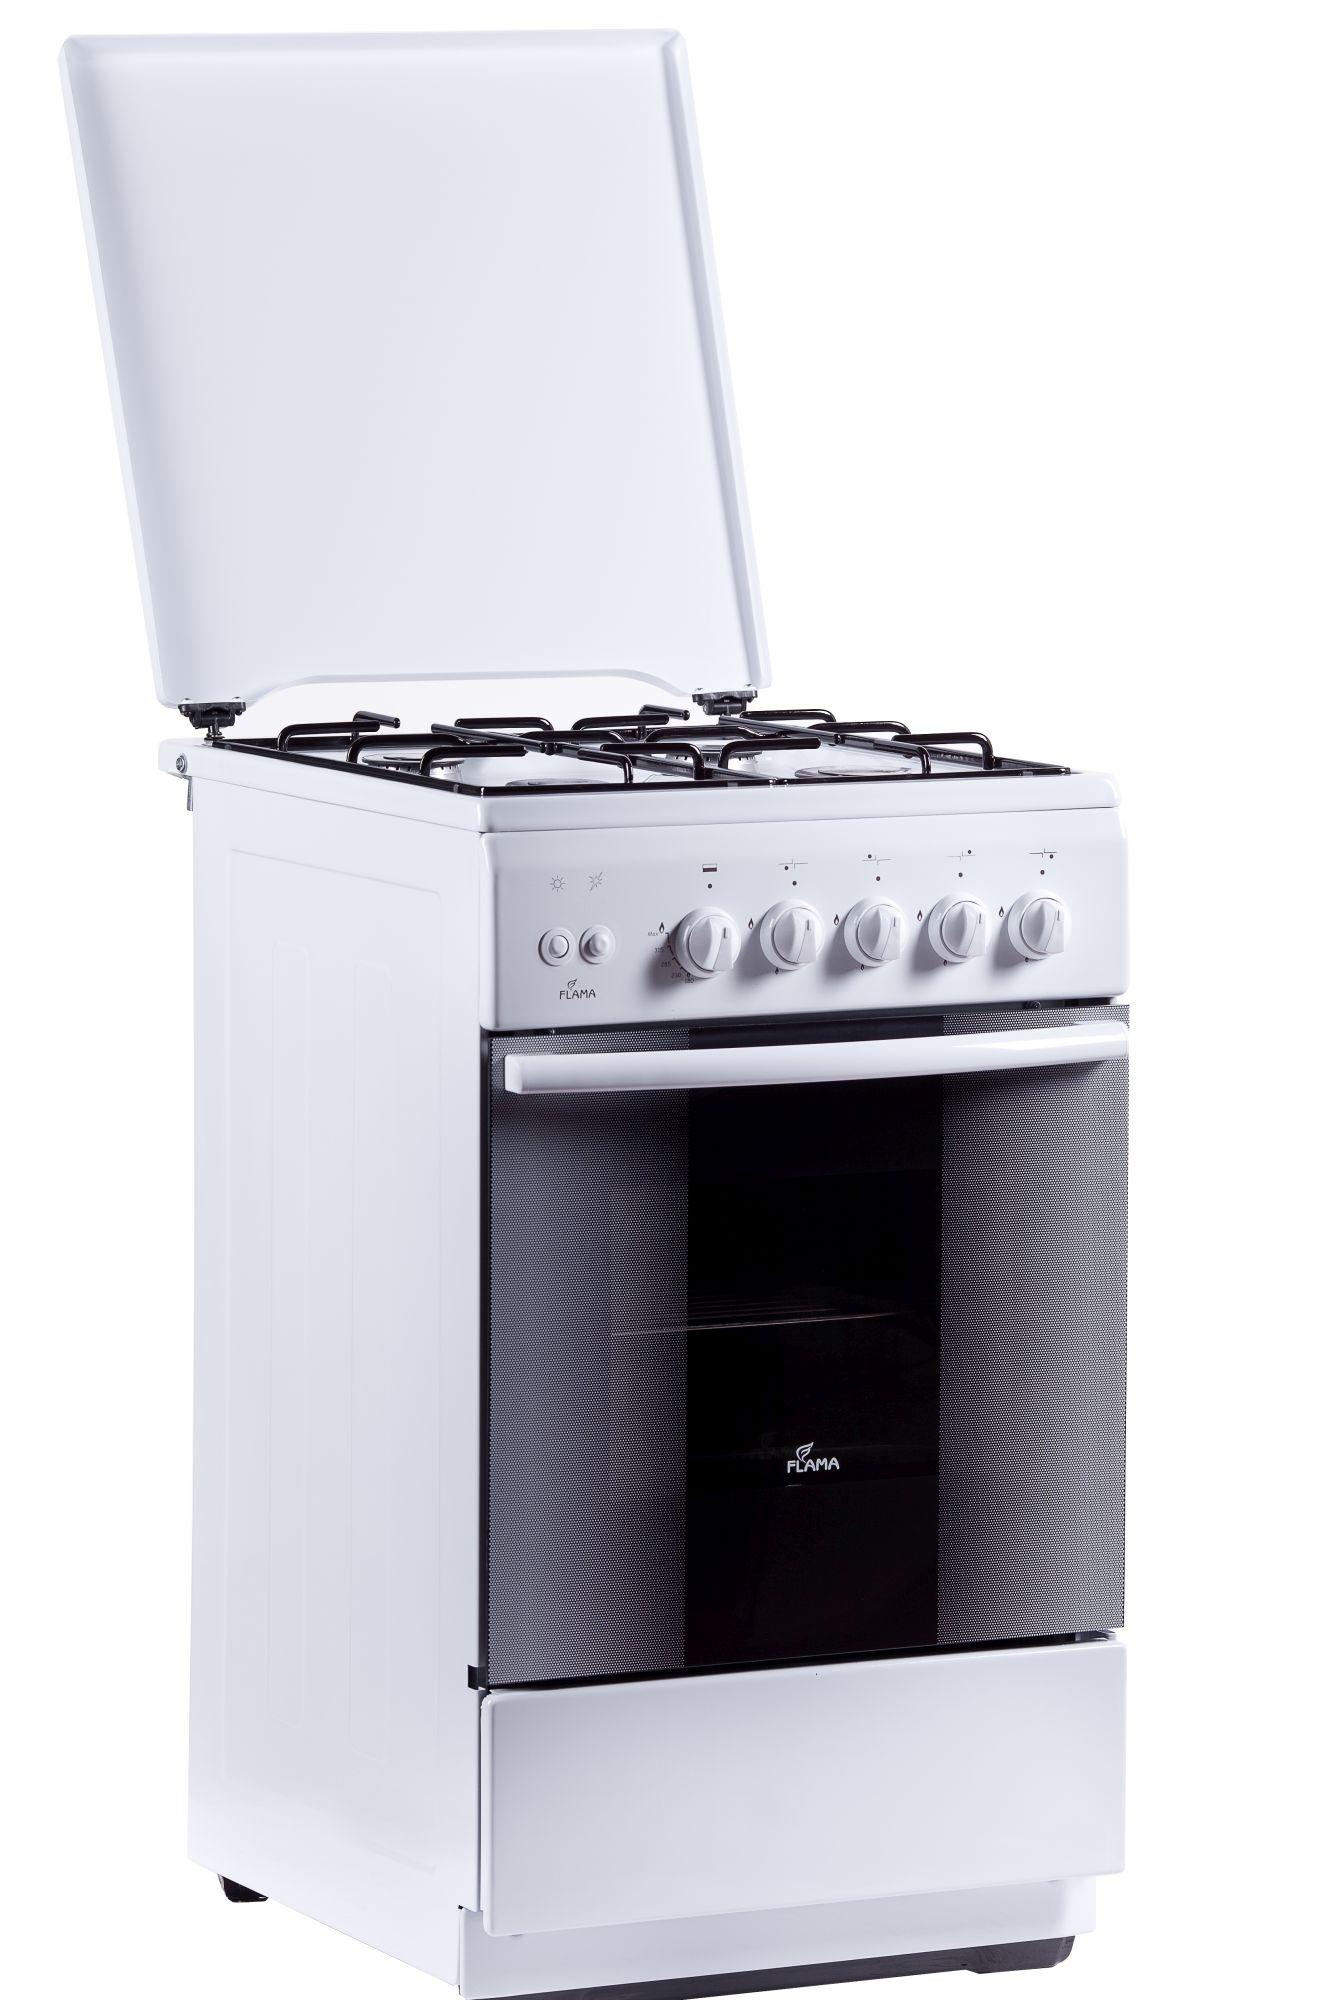 Flama FG 2426 W, White плита газовая